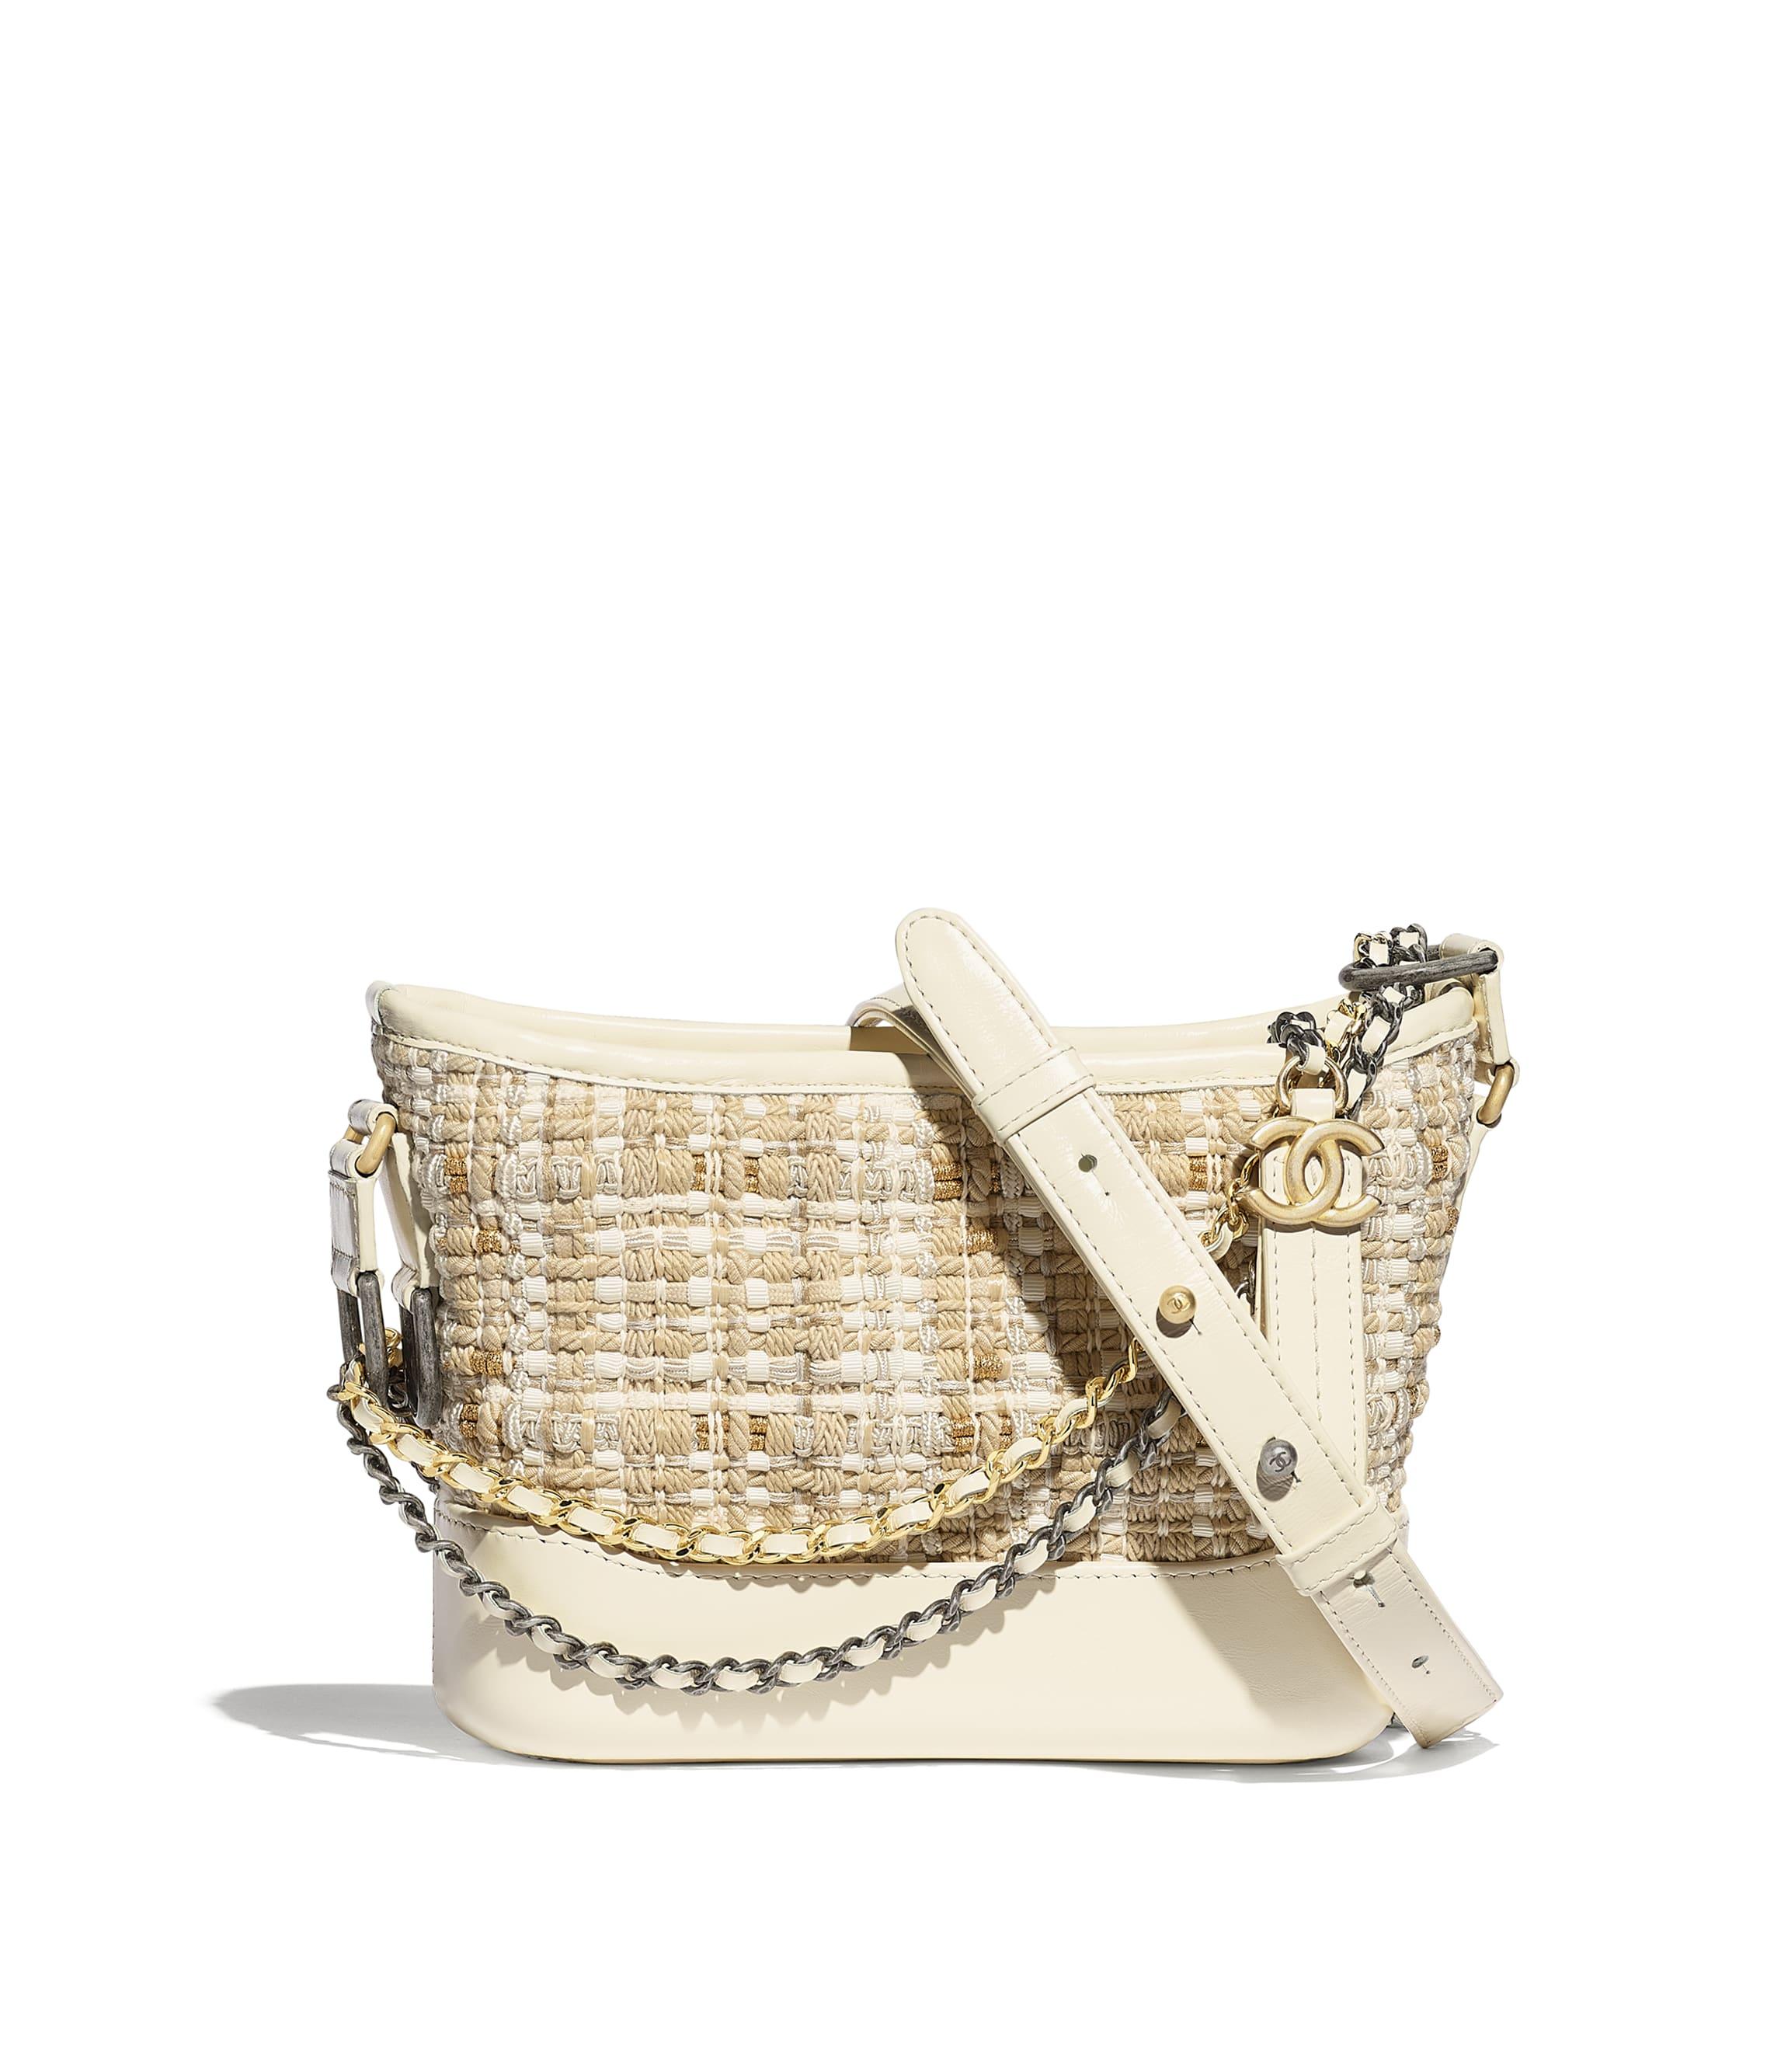 49d968035d0a CHANEL s GABRIELLE - Handbags - CHANEL